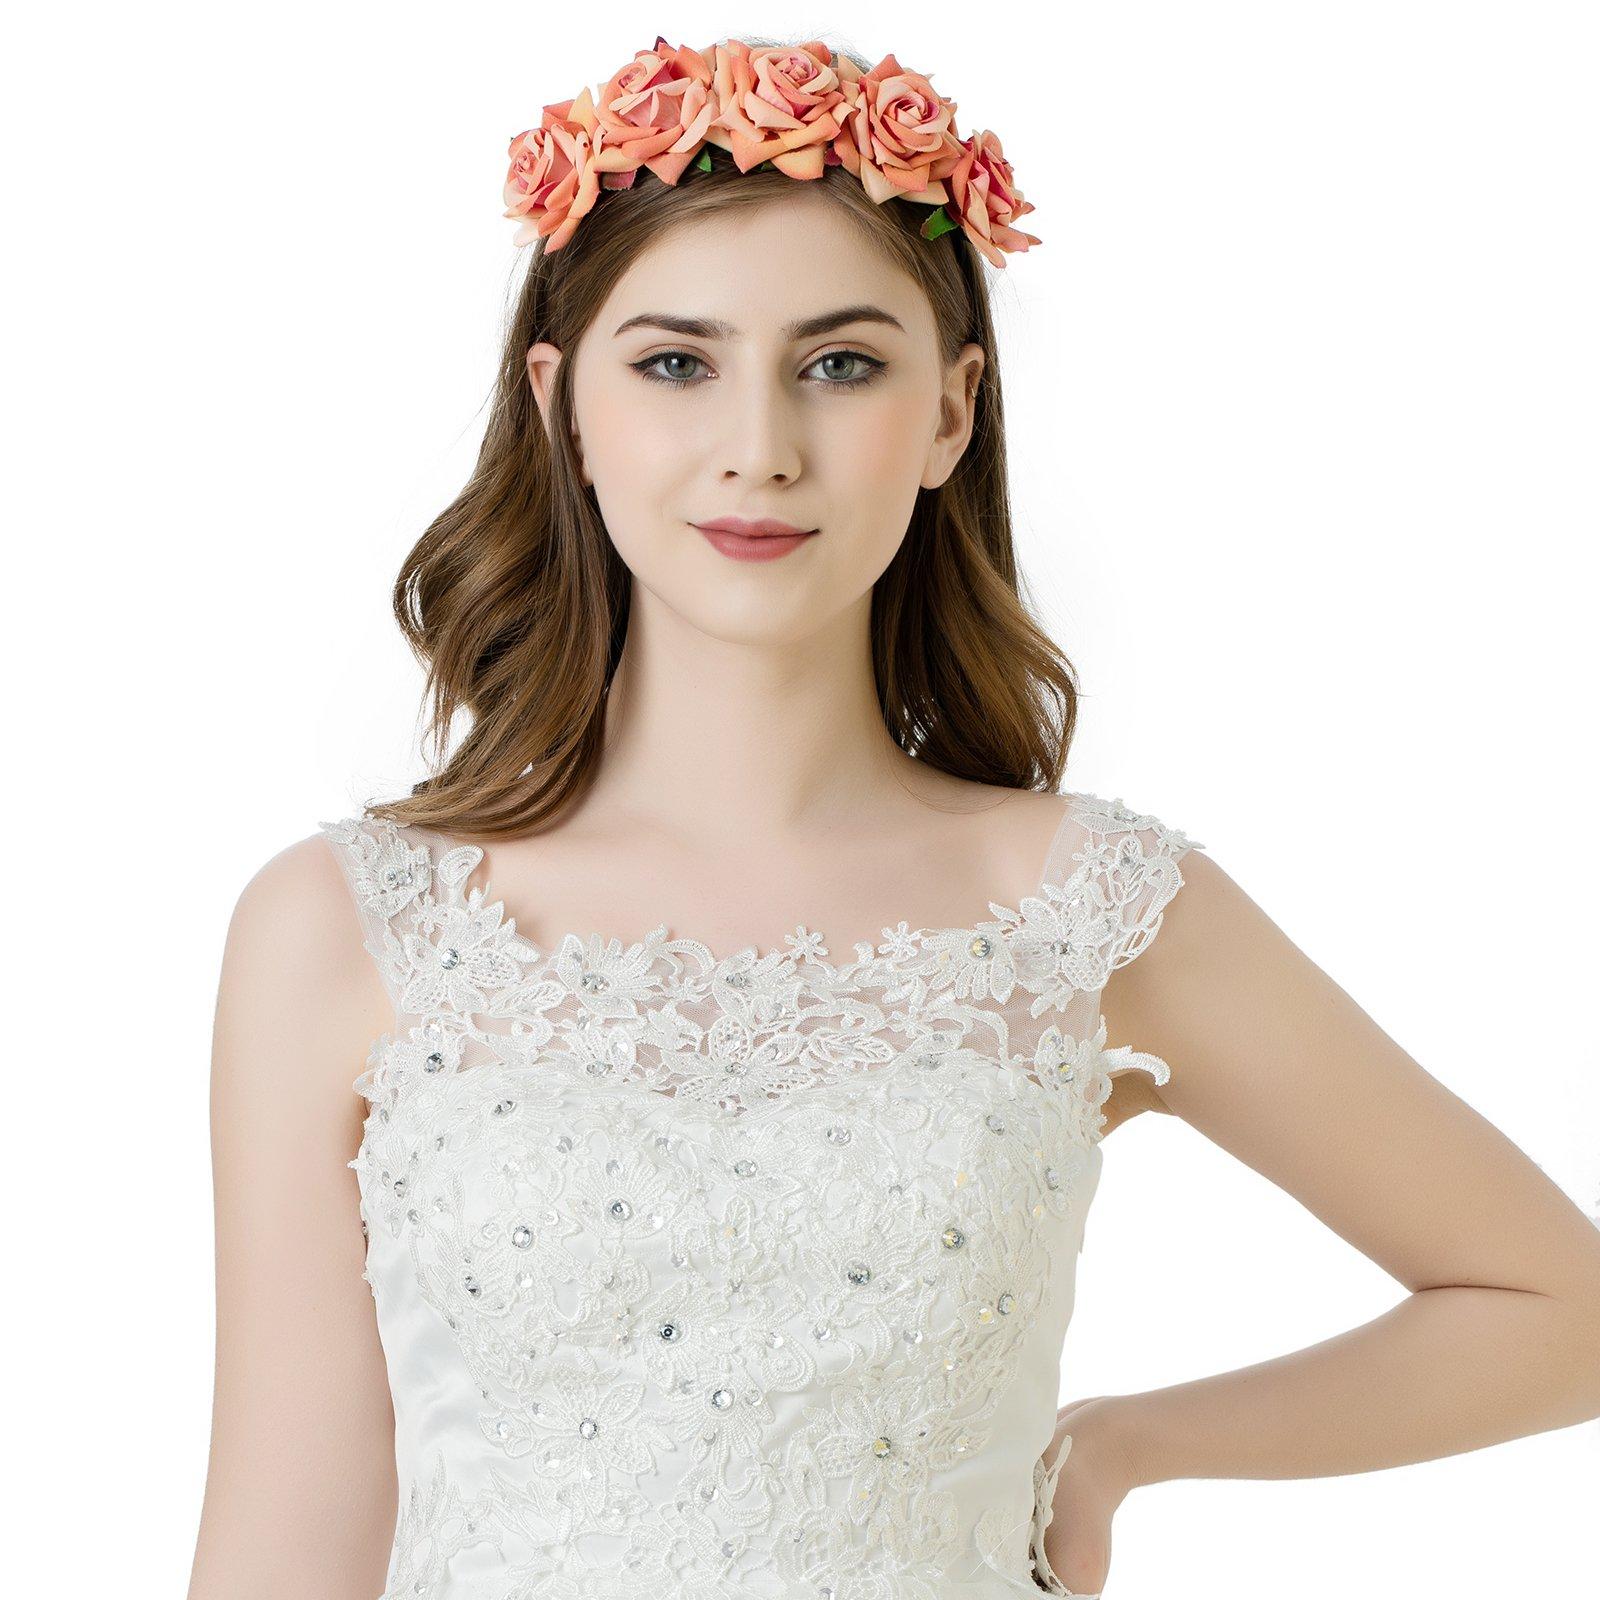 Wedding flower crown headpiece amazon girls rose flower crown headband bride or bridemaid hairband floral garland headpiecebohemia styles izmirmasajfo